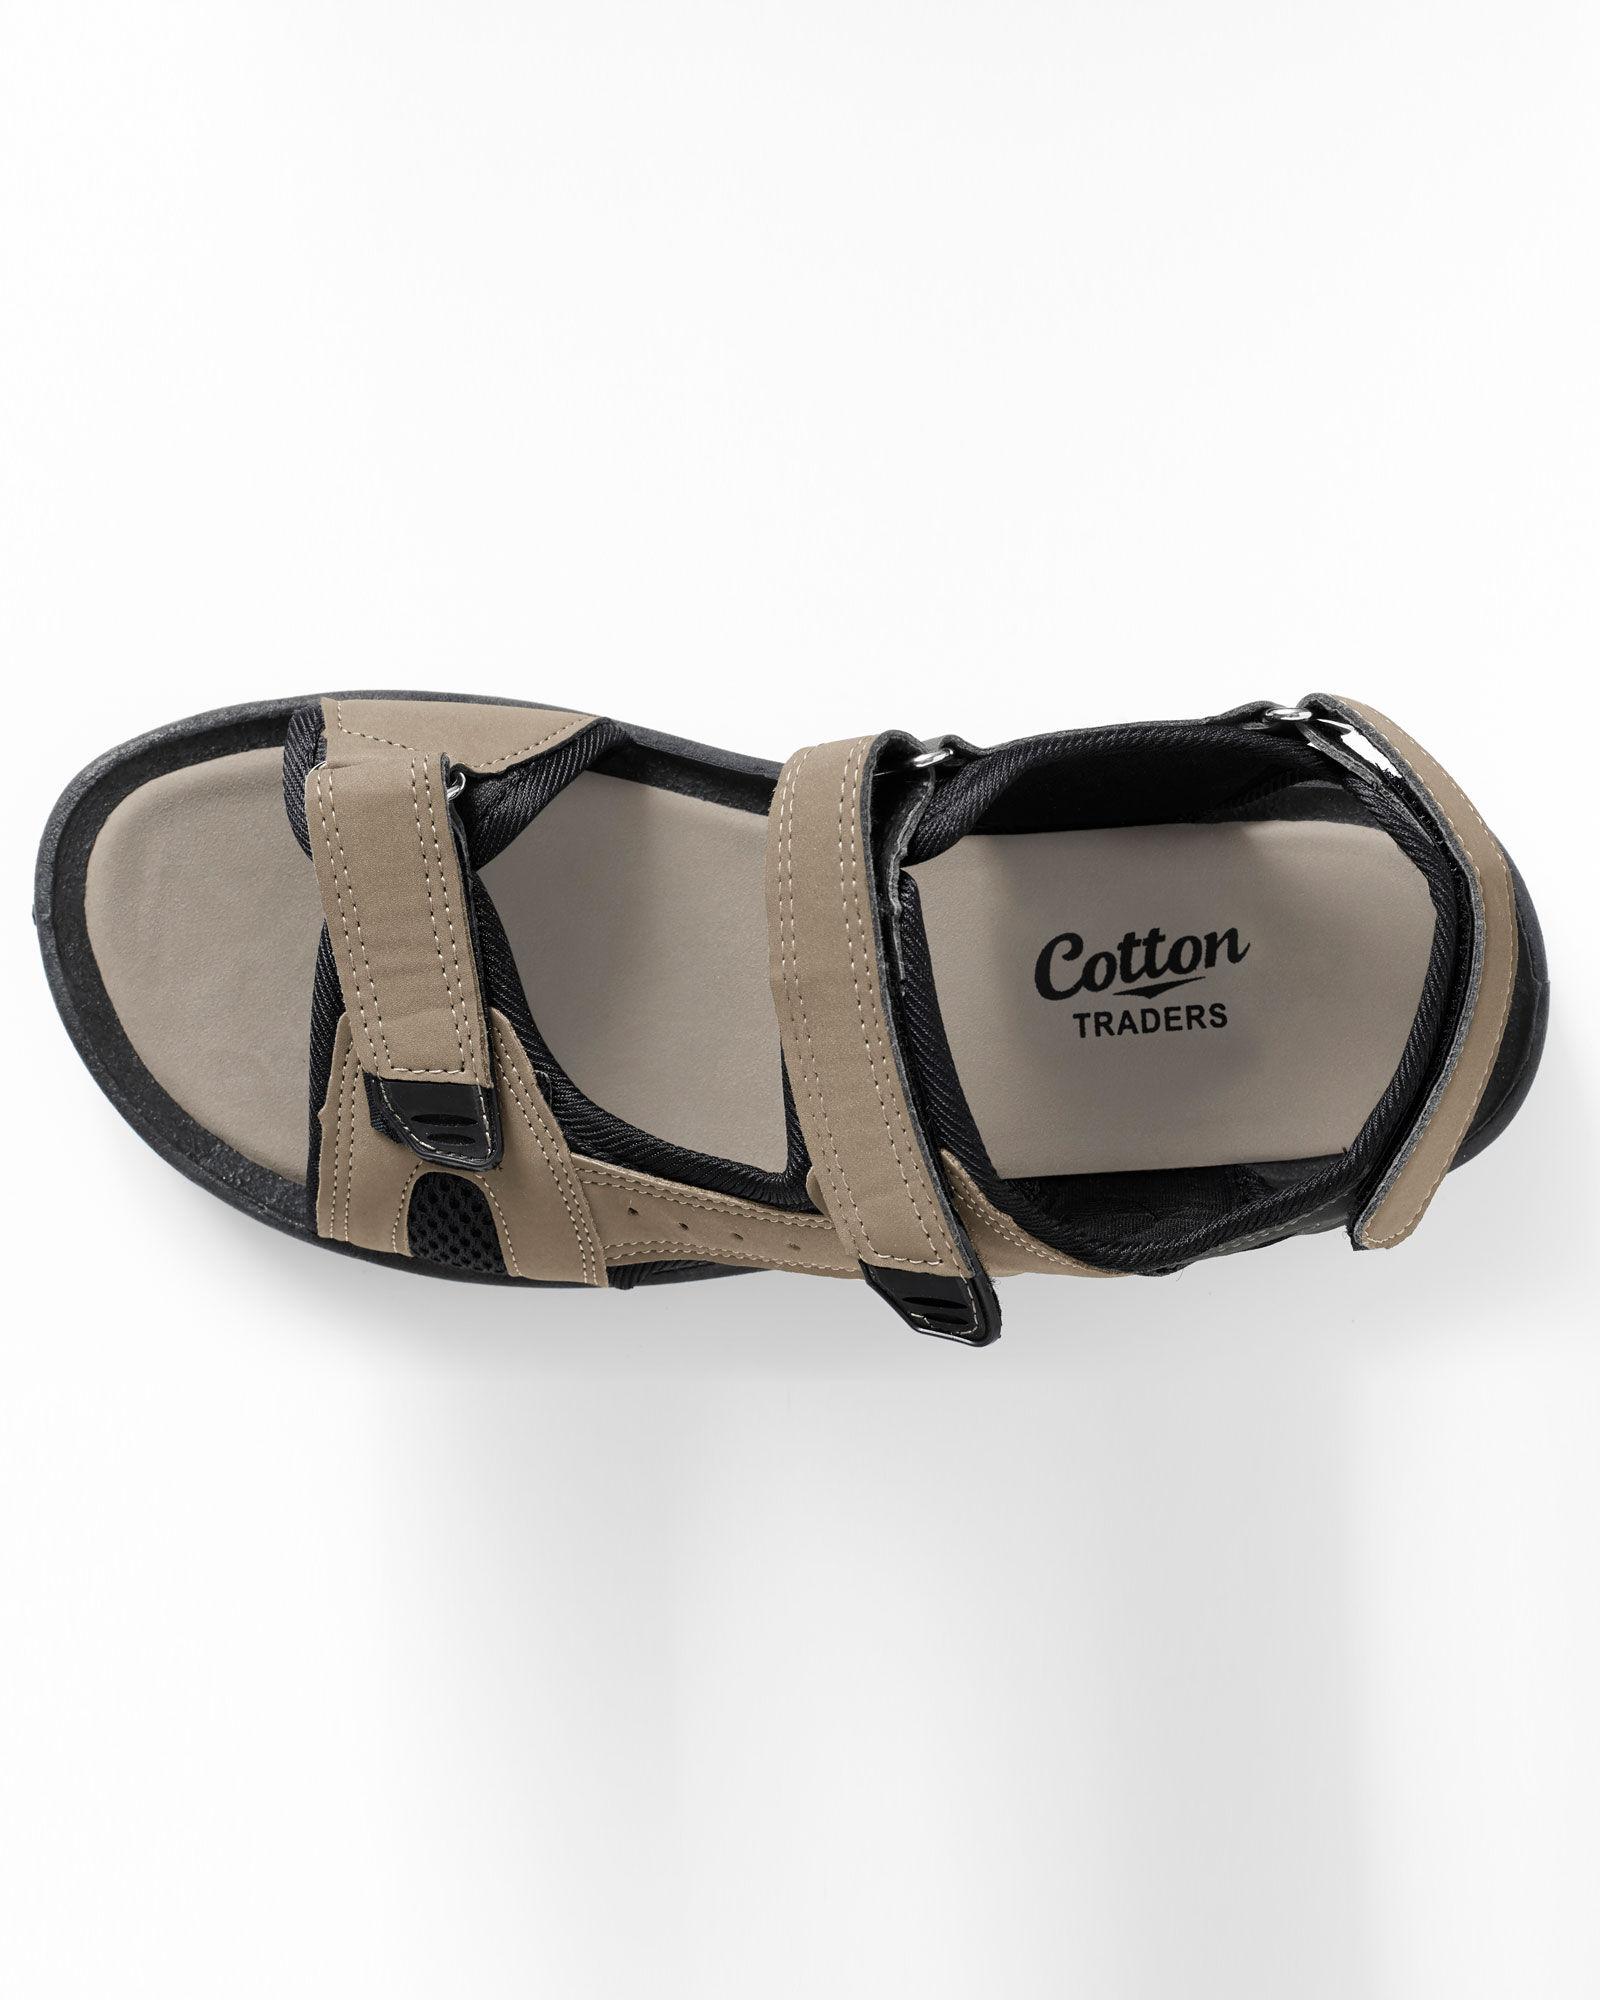 Strider Sandals at Cotton Traders